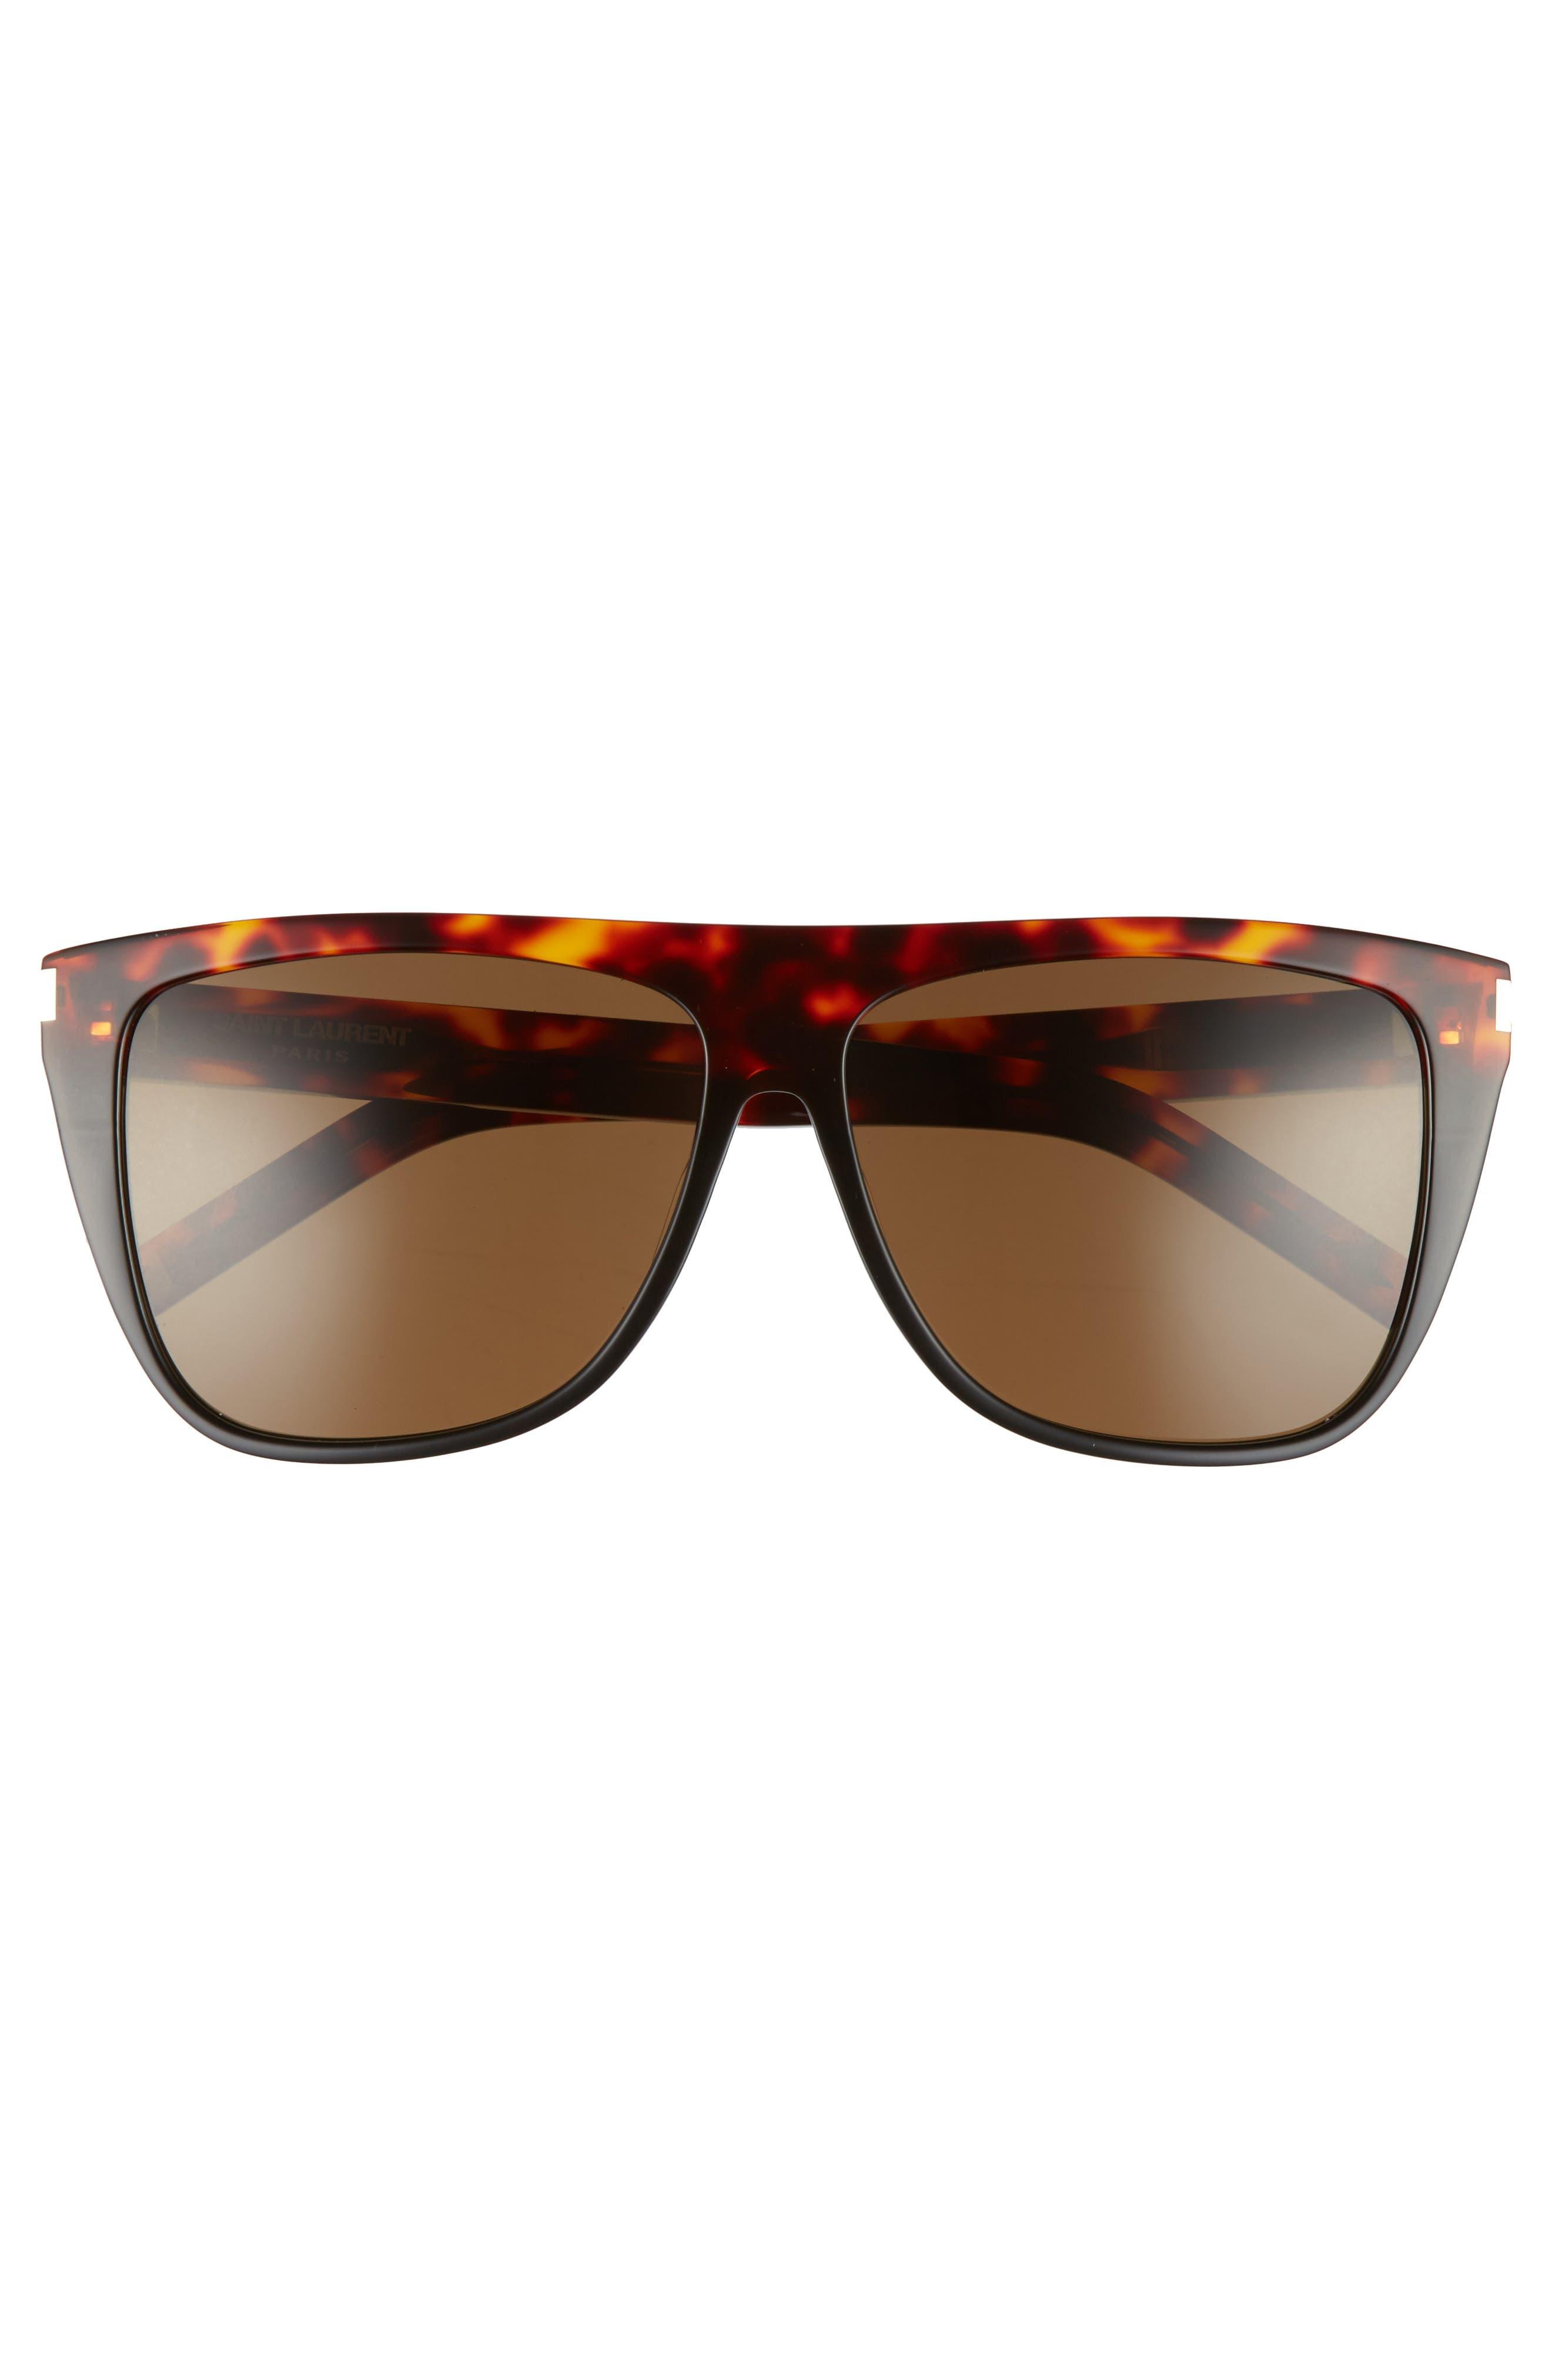 SL1 59mm Flat Top Sunglasses,                             Alternate thumbnail 3, color,                             HAVANA